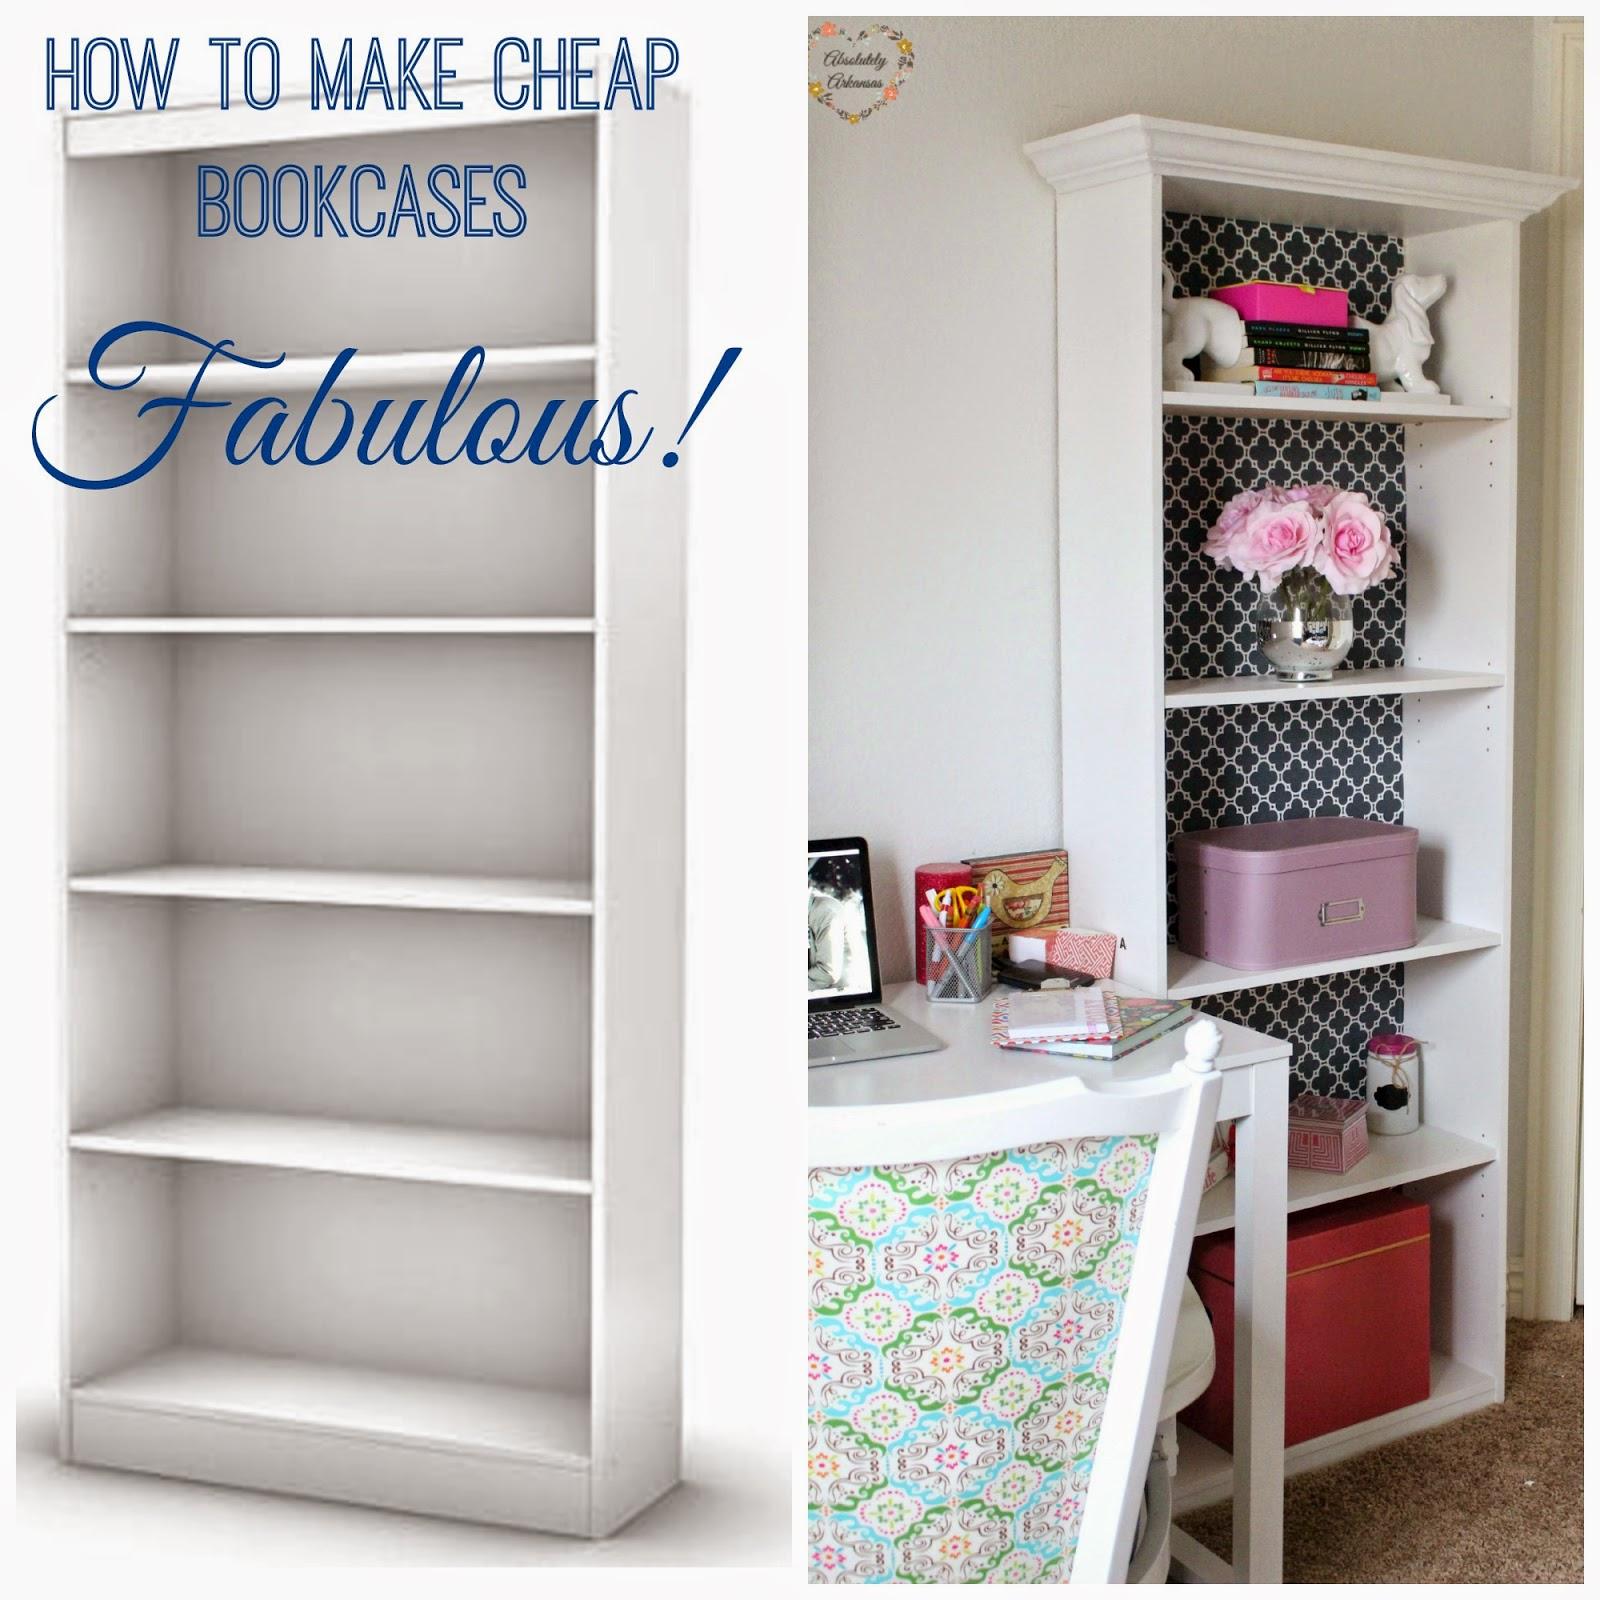 Rose & Co Blog: Girly Office Progress: Making Cheap